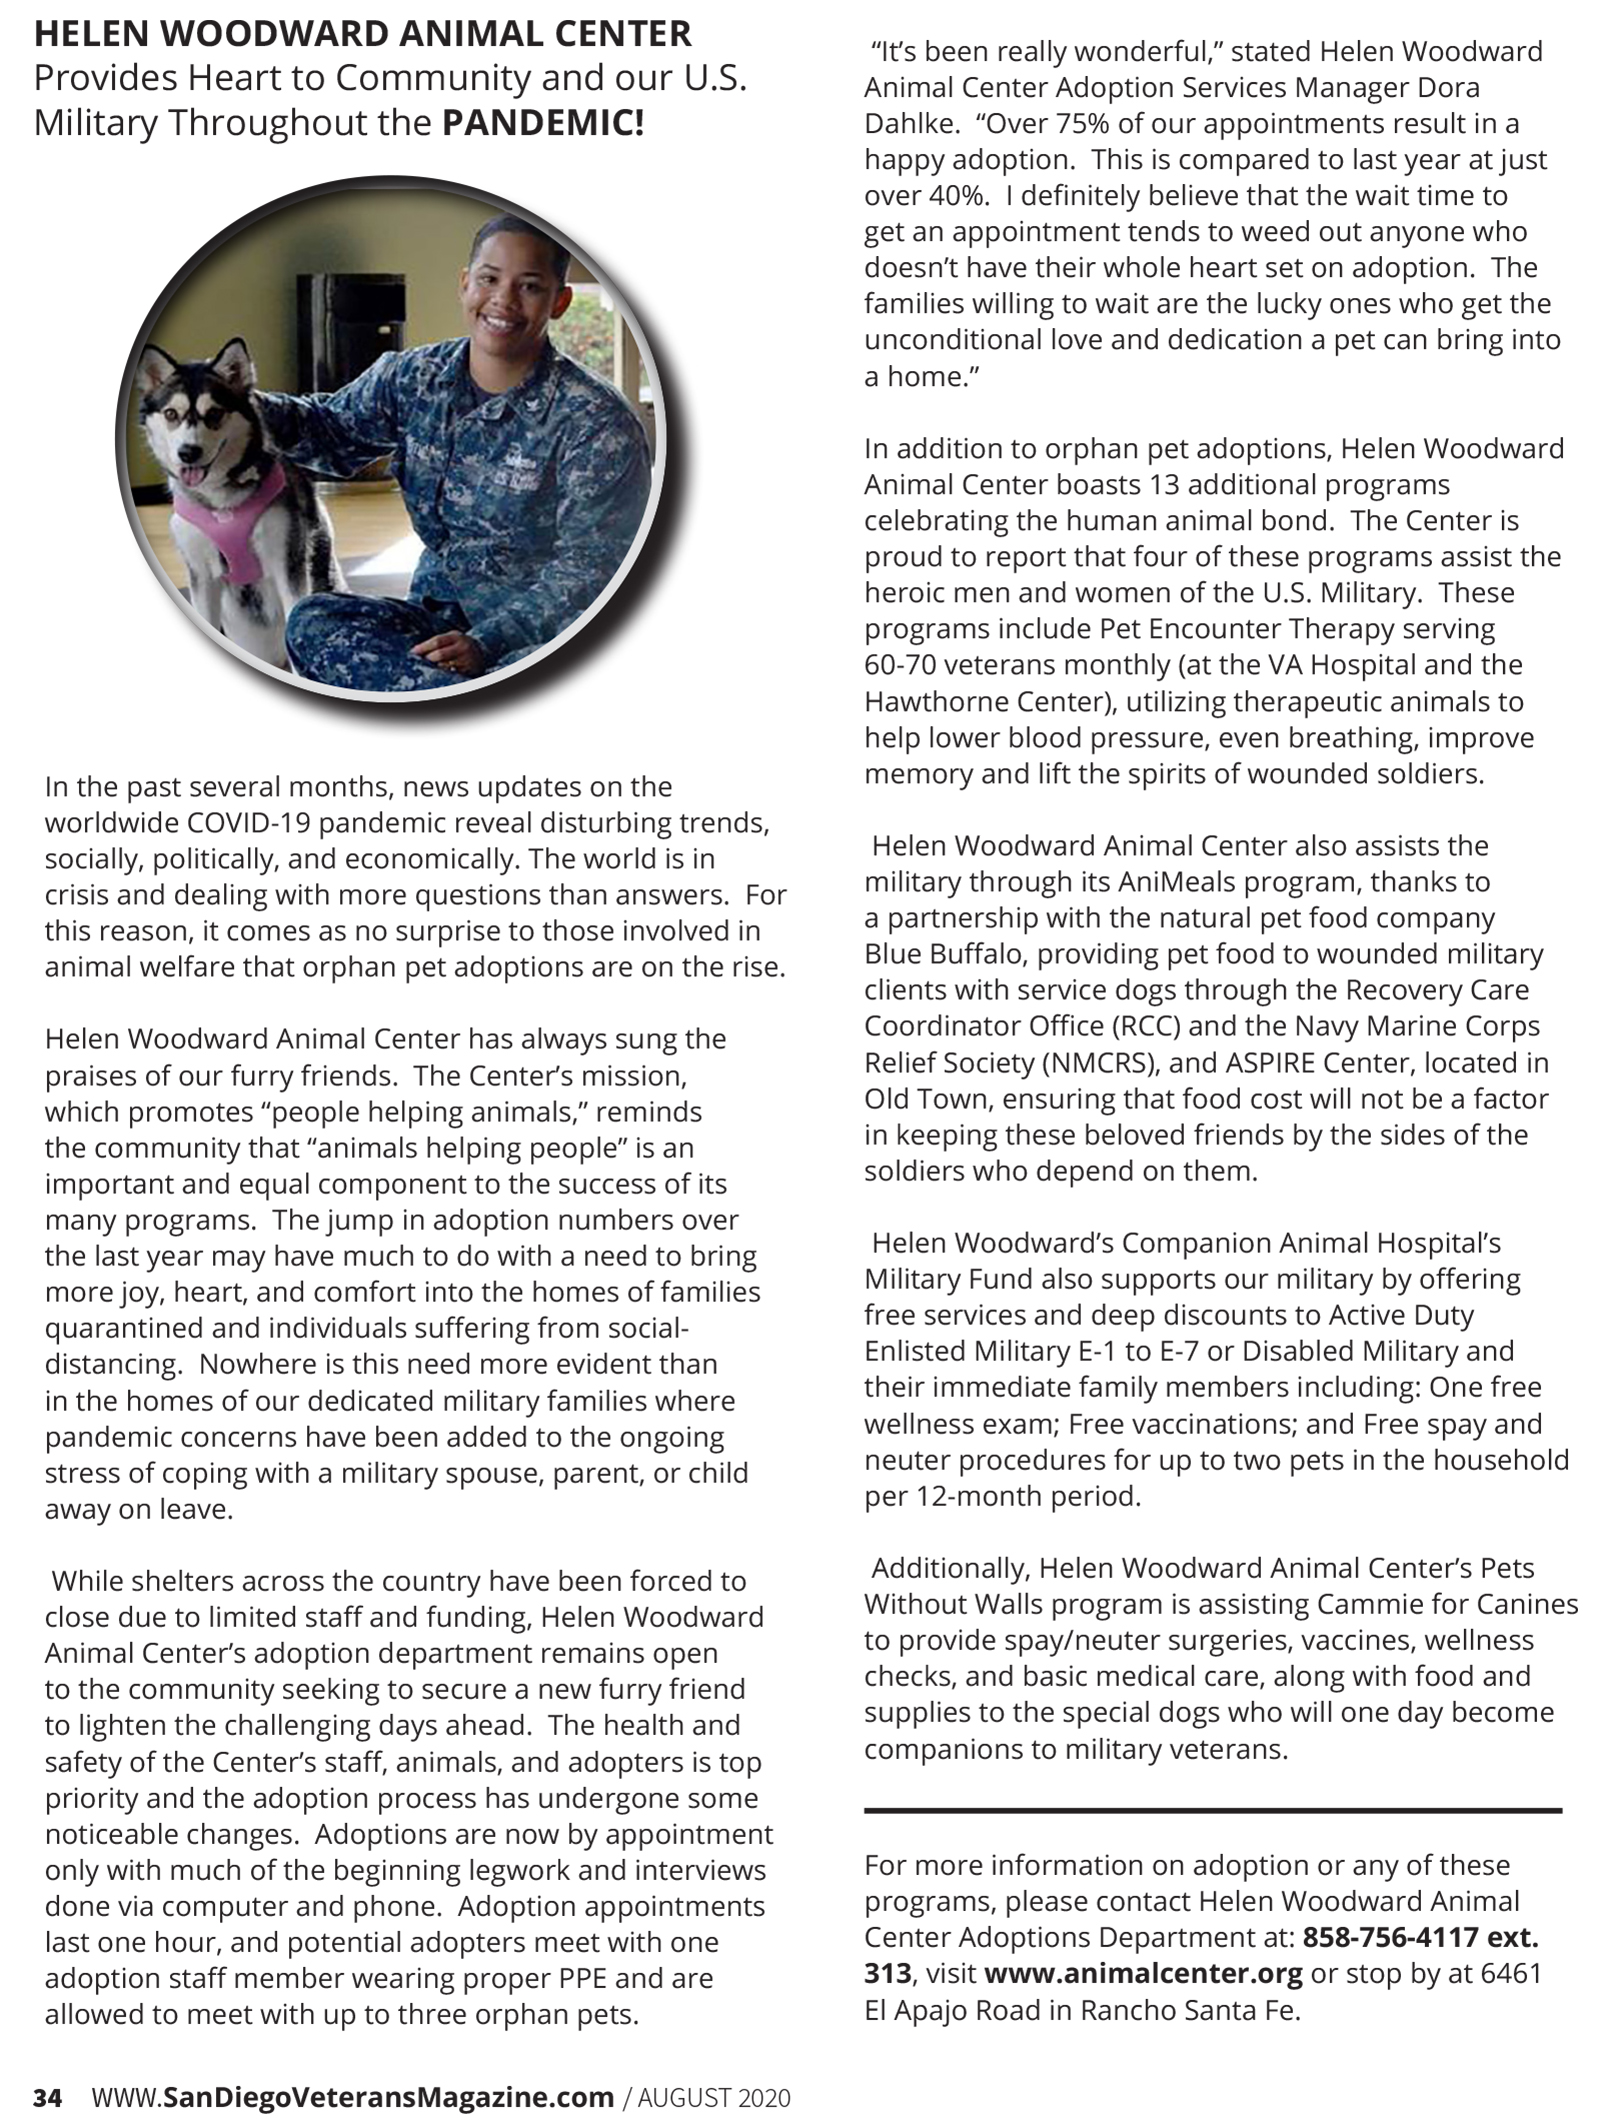 https://secureservercdn.net/45.40.144.200/smu.6f6.myftpupload.com/wp-content/uploads/2020/08/Helen-Woodward-August-2020-SDV-Magazine.jpg